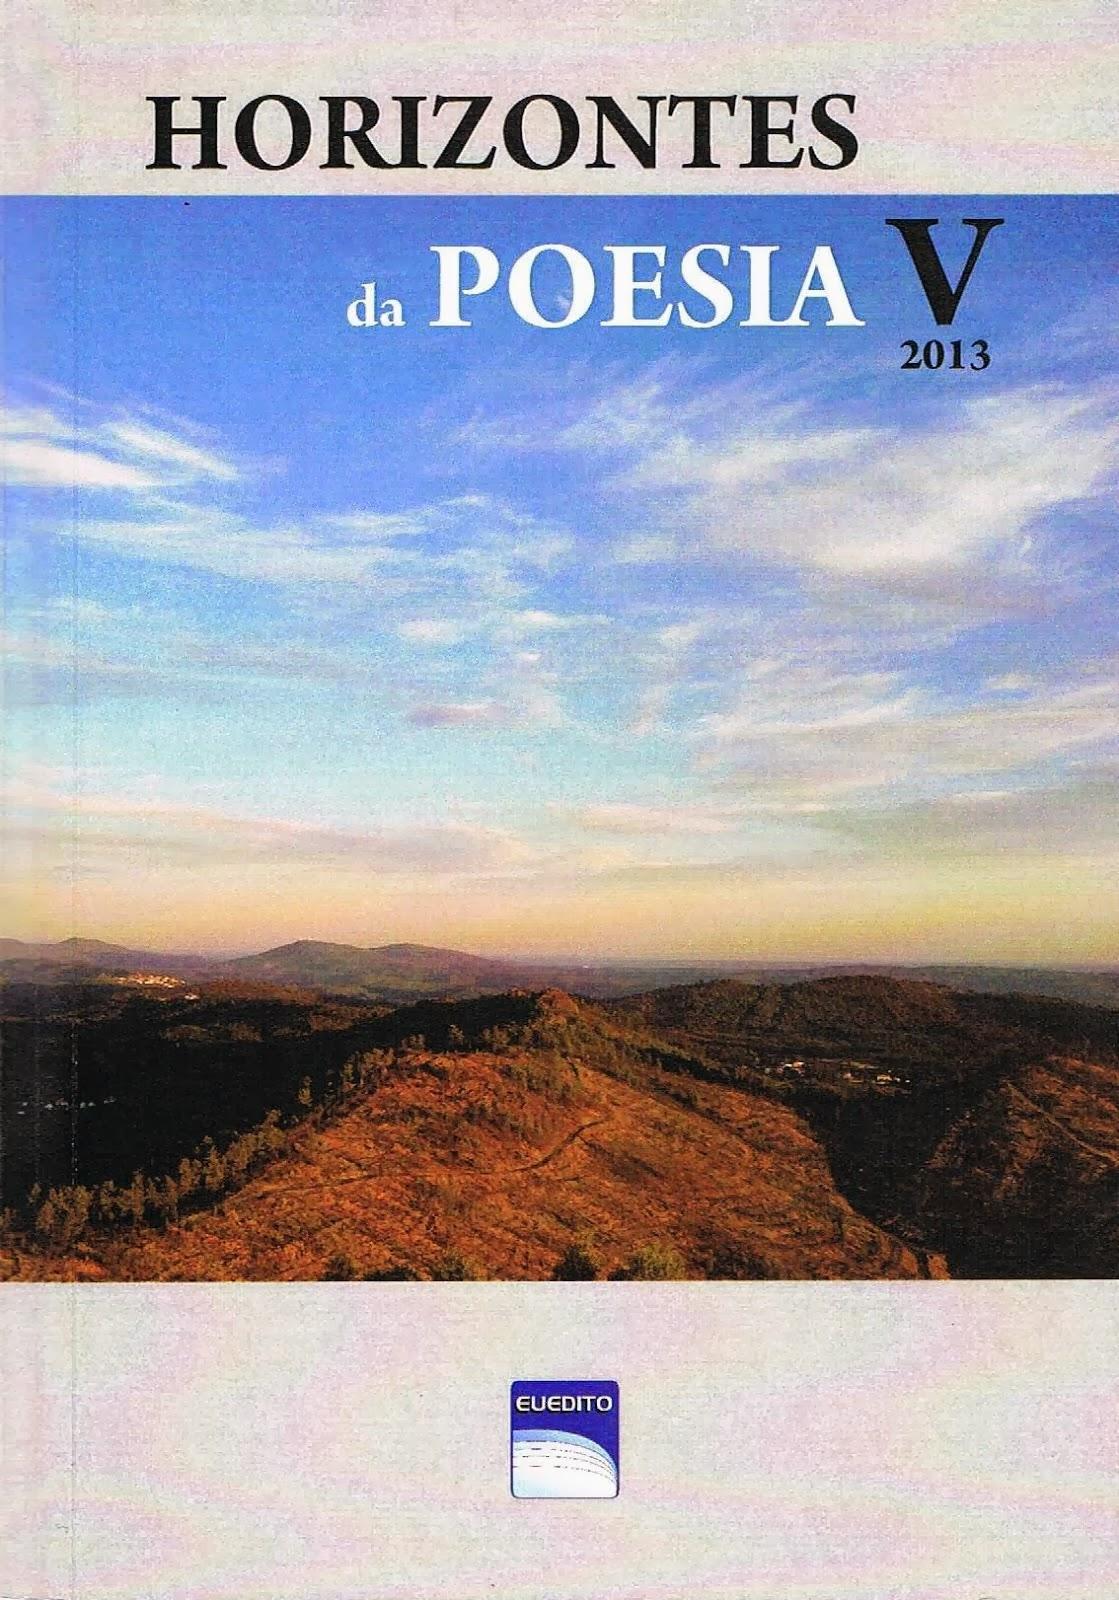 """Horizontes da Poesia V"" - 2013"